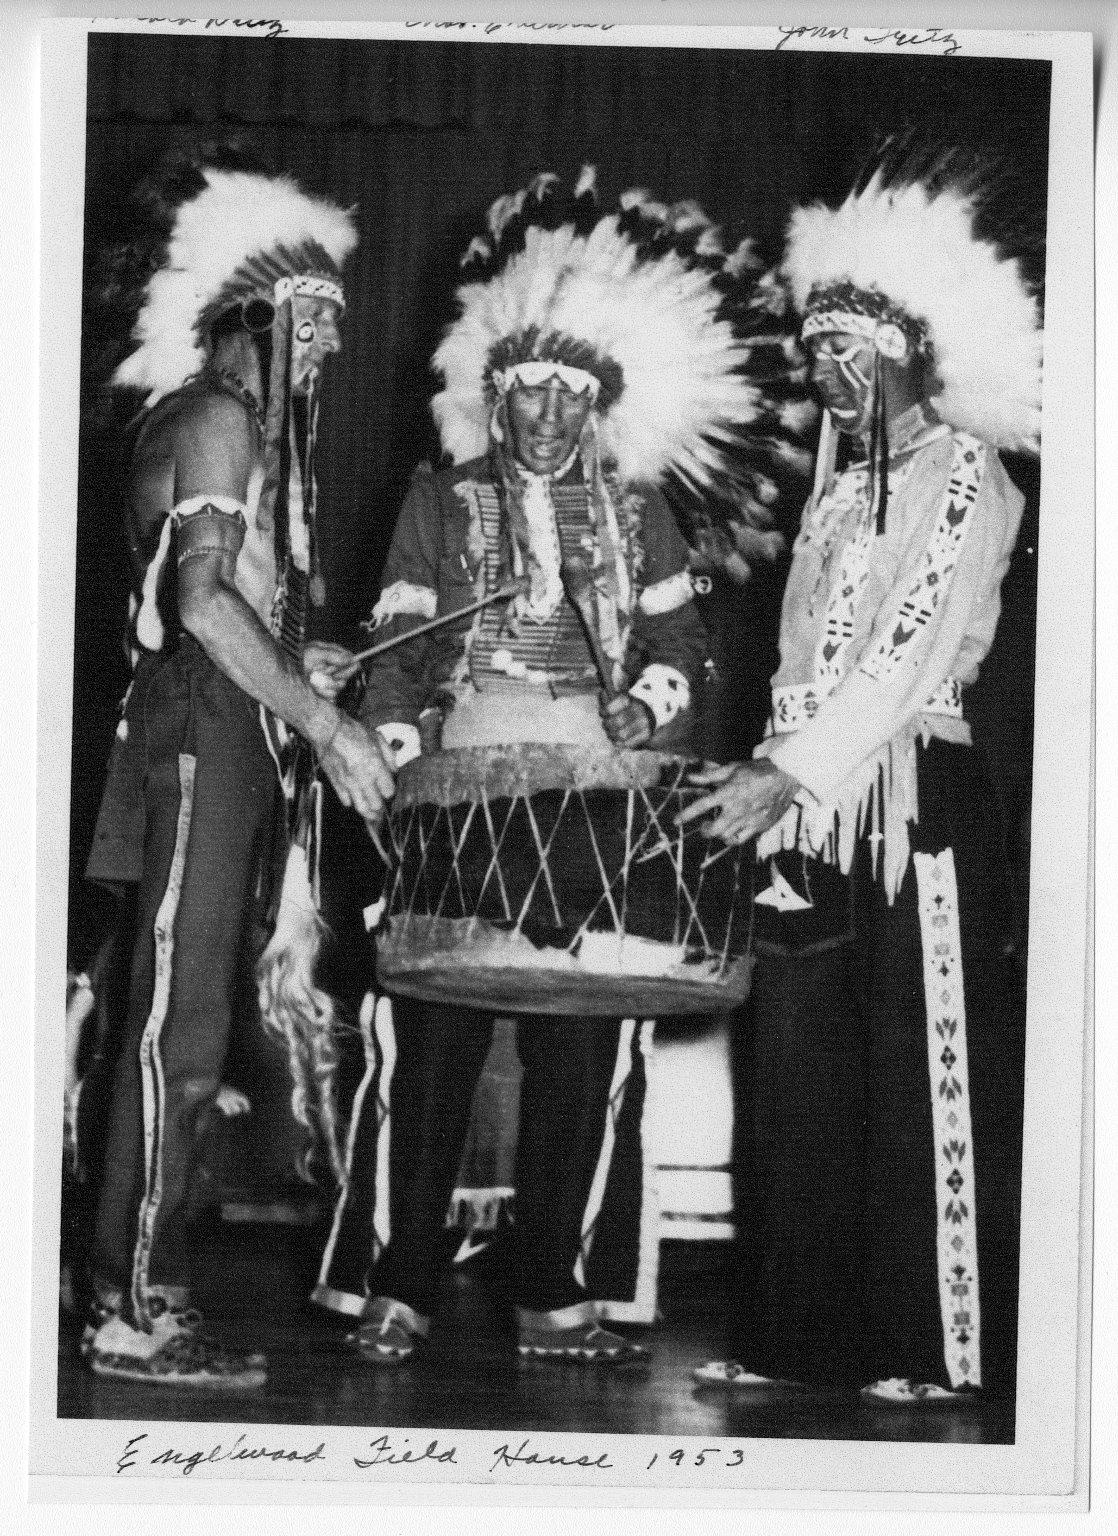 Charles Eberhart, Harold Diltz, and John Fritz